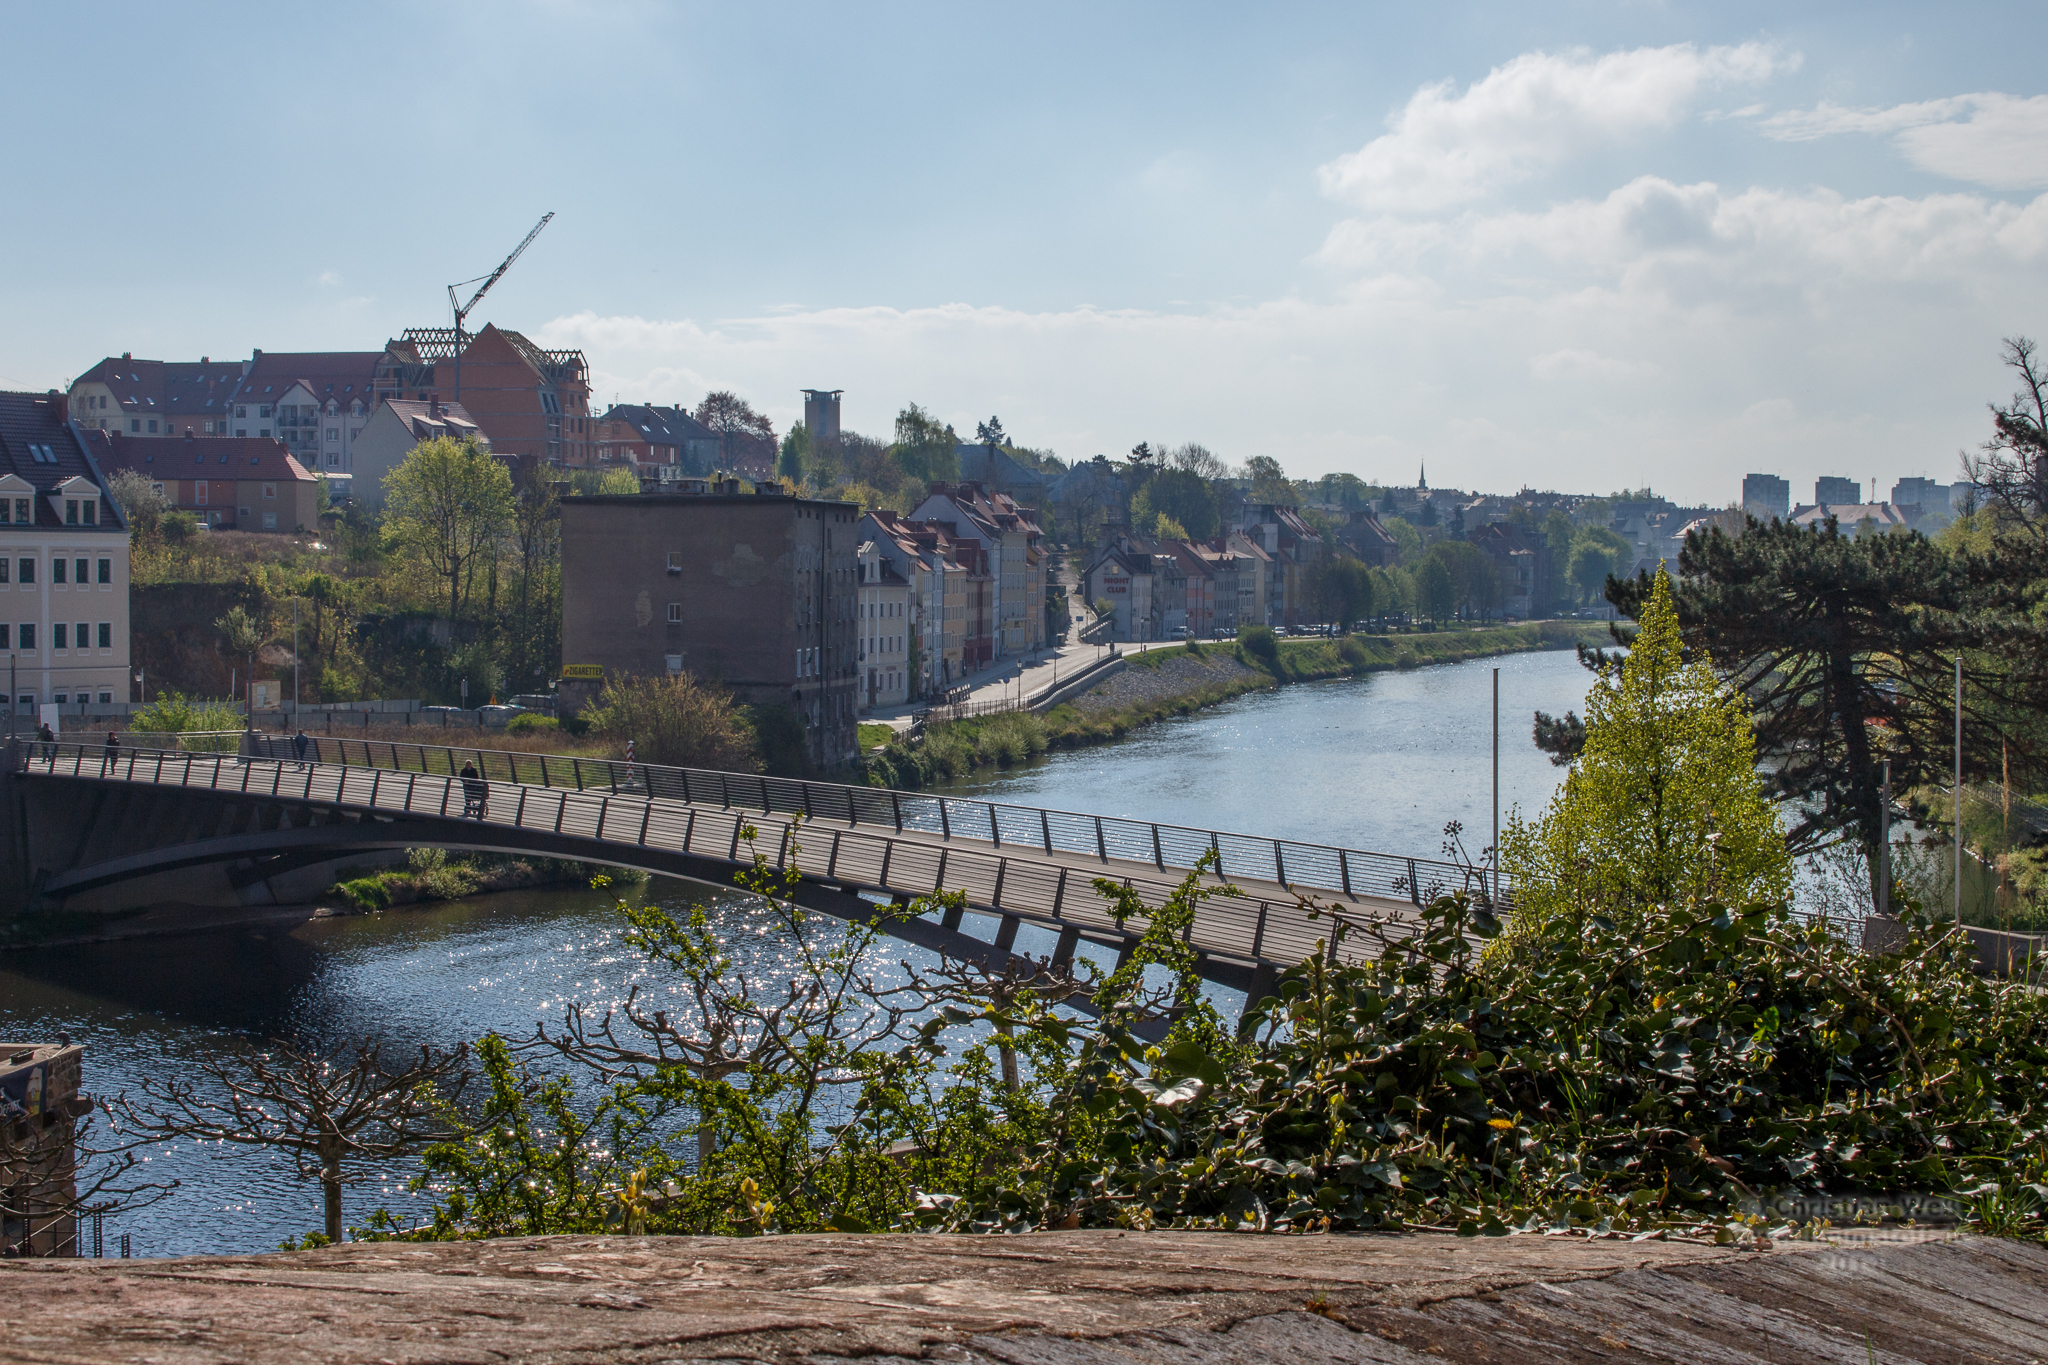 Altstadtbrücke und Neiße